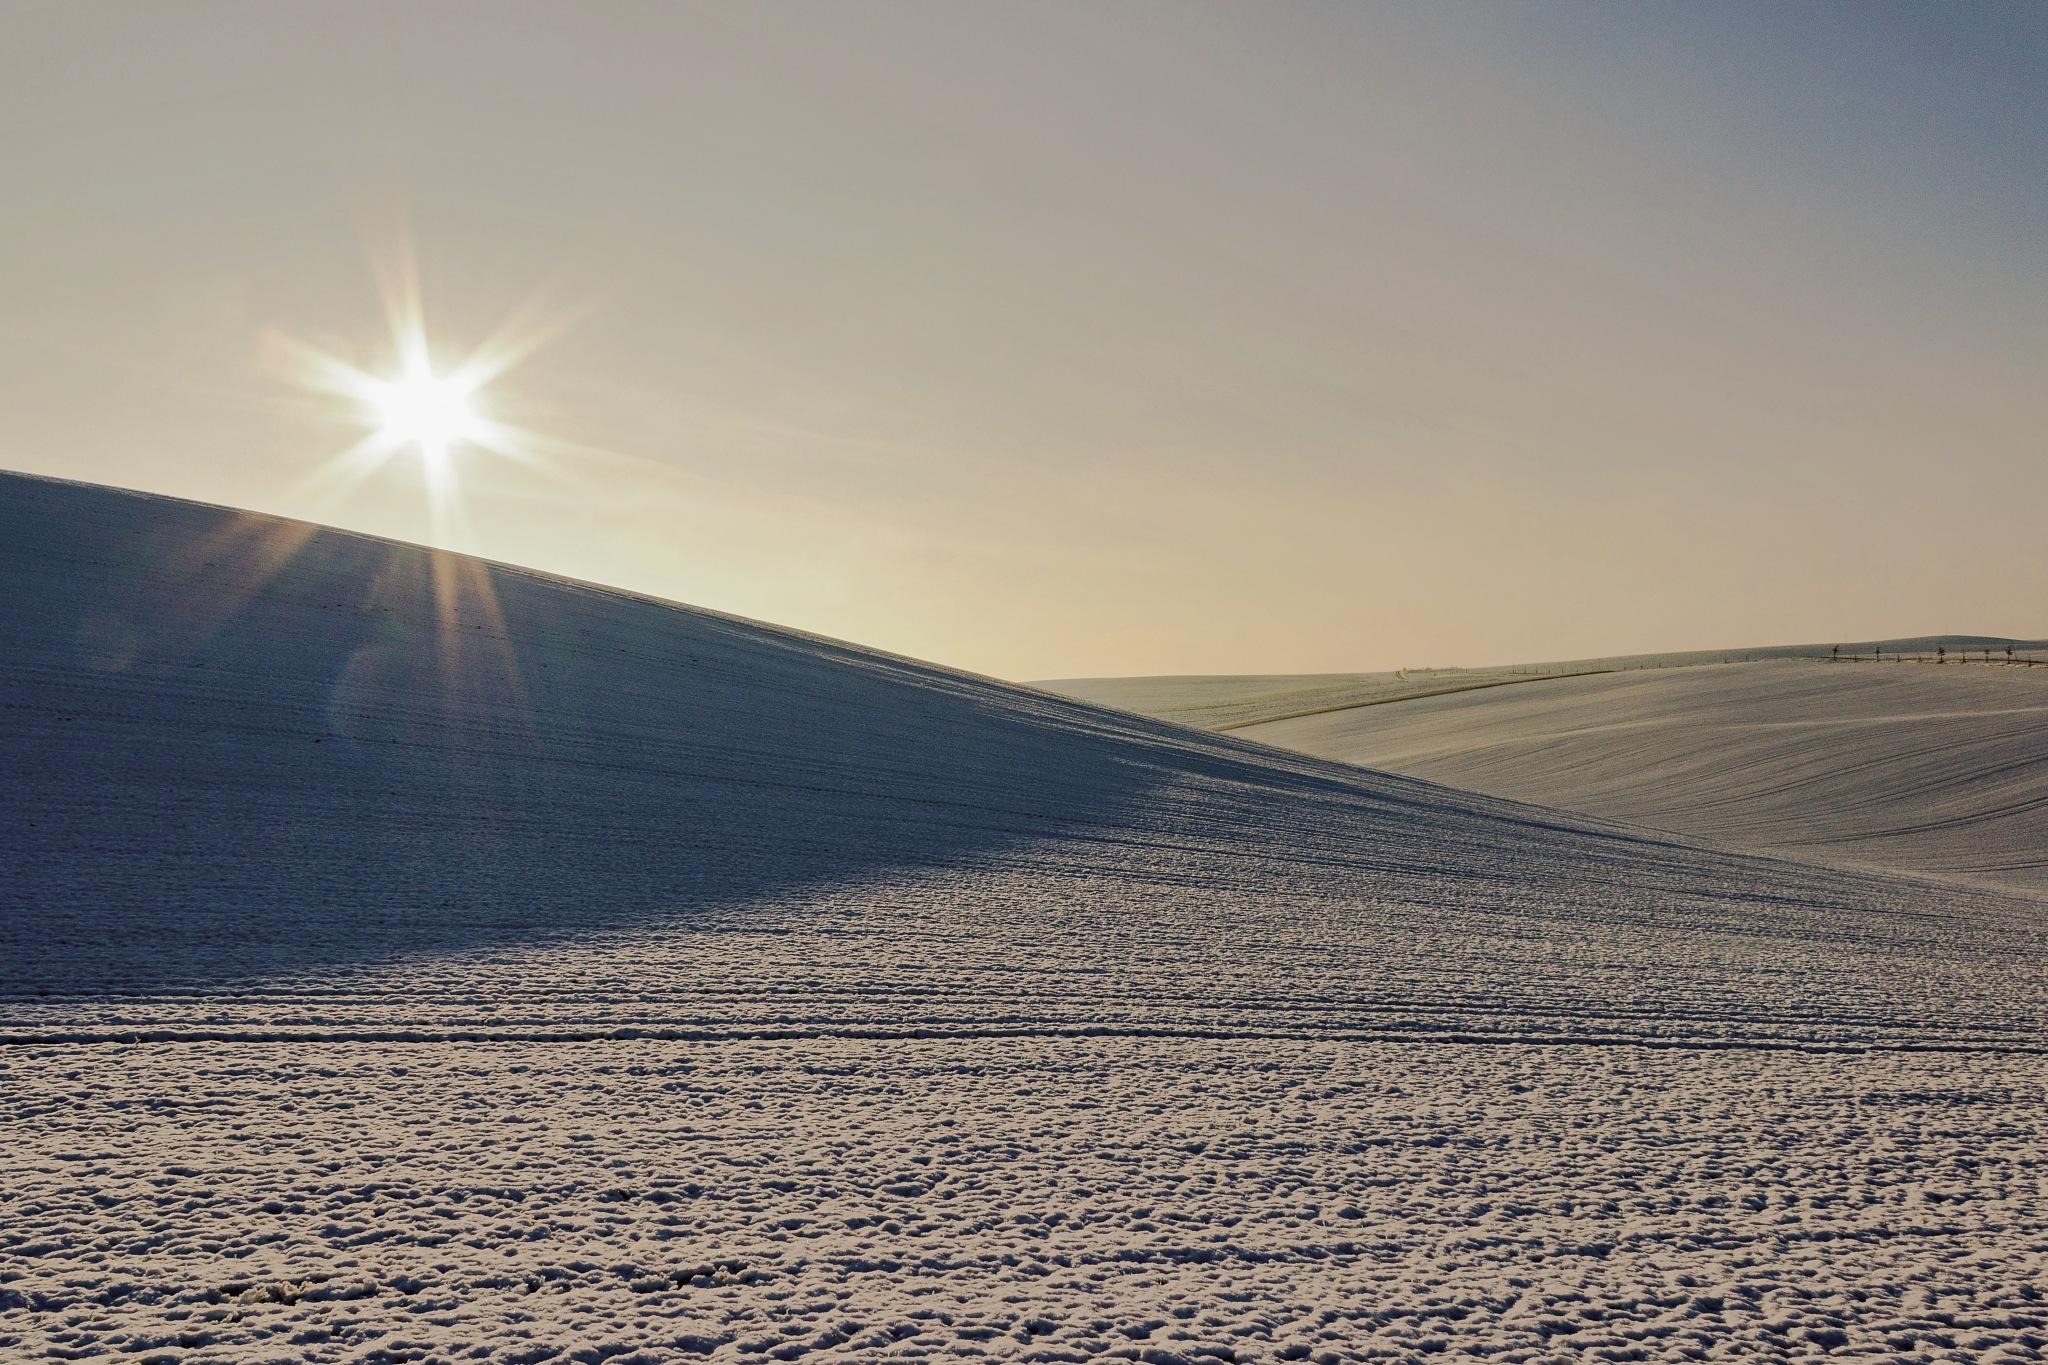 Morning in Moravian Tuscany by Josef Hasík